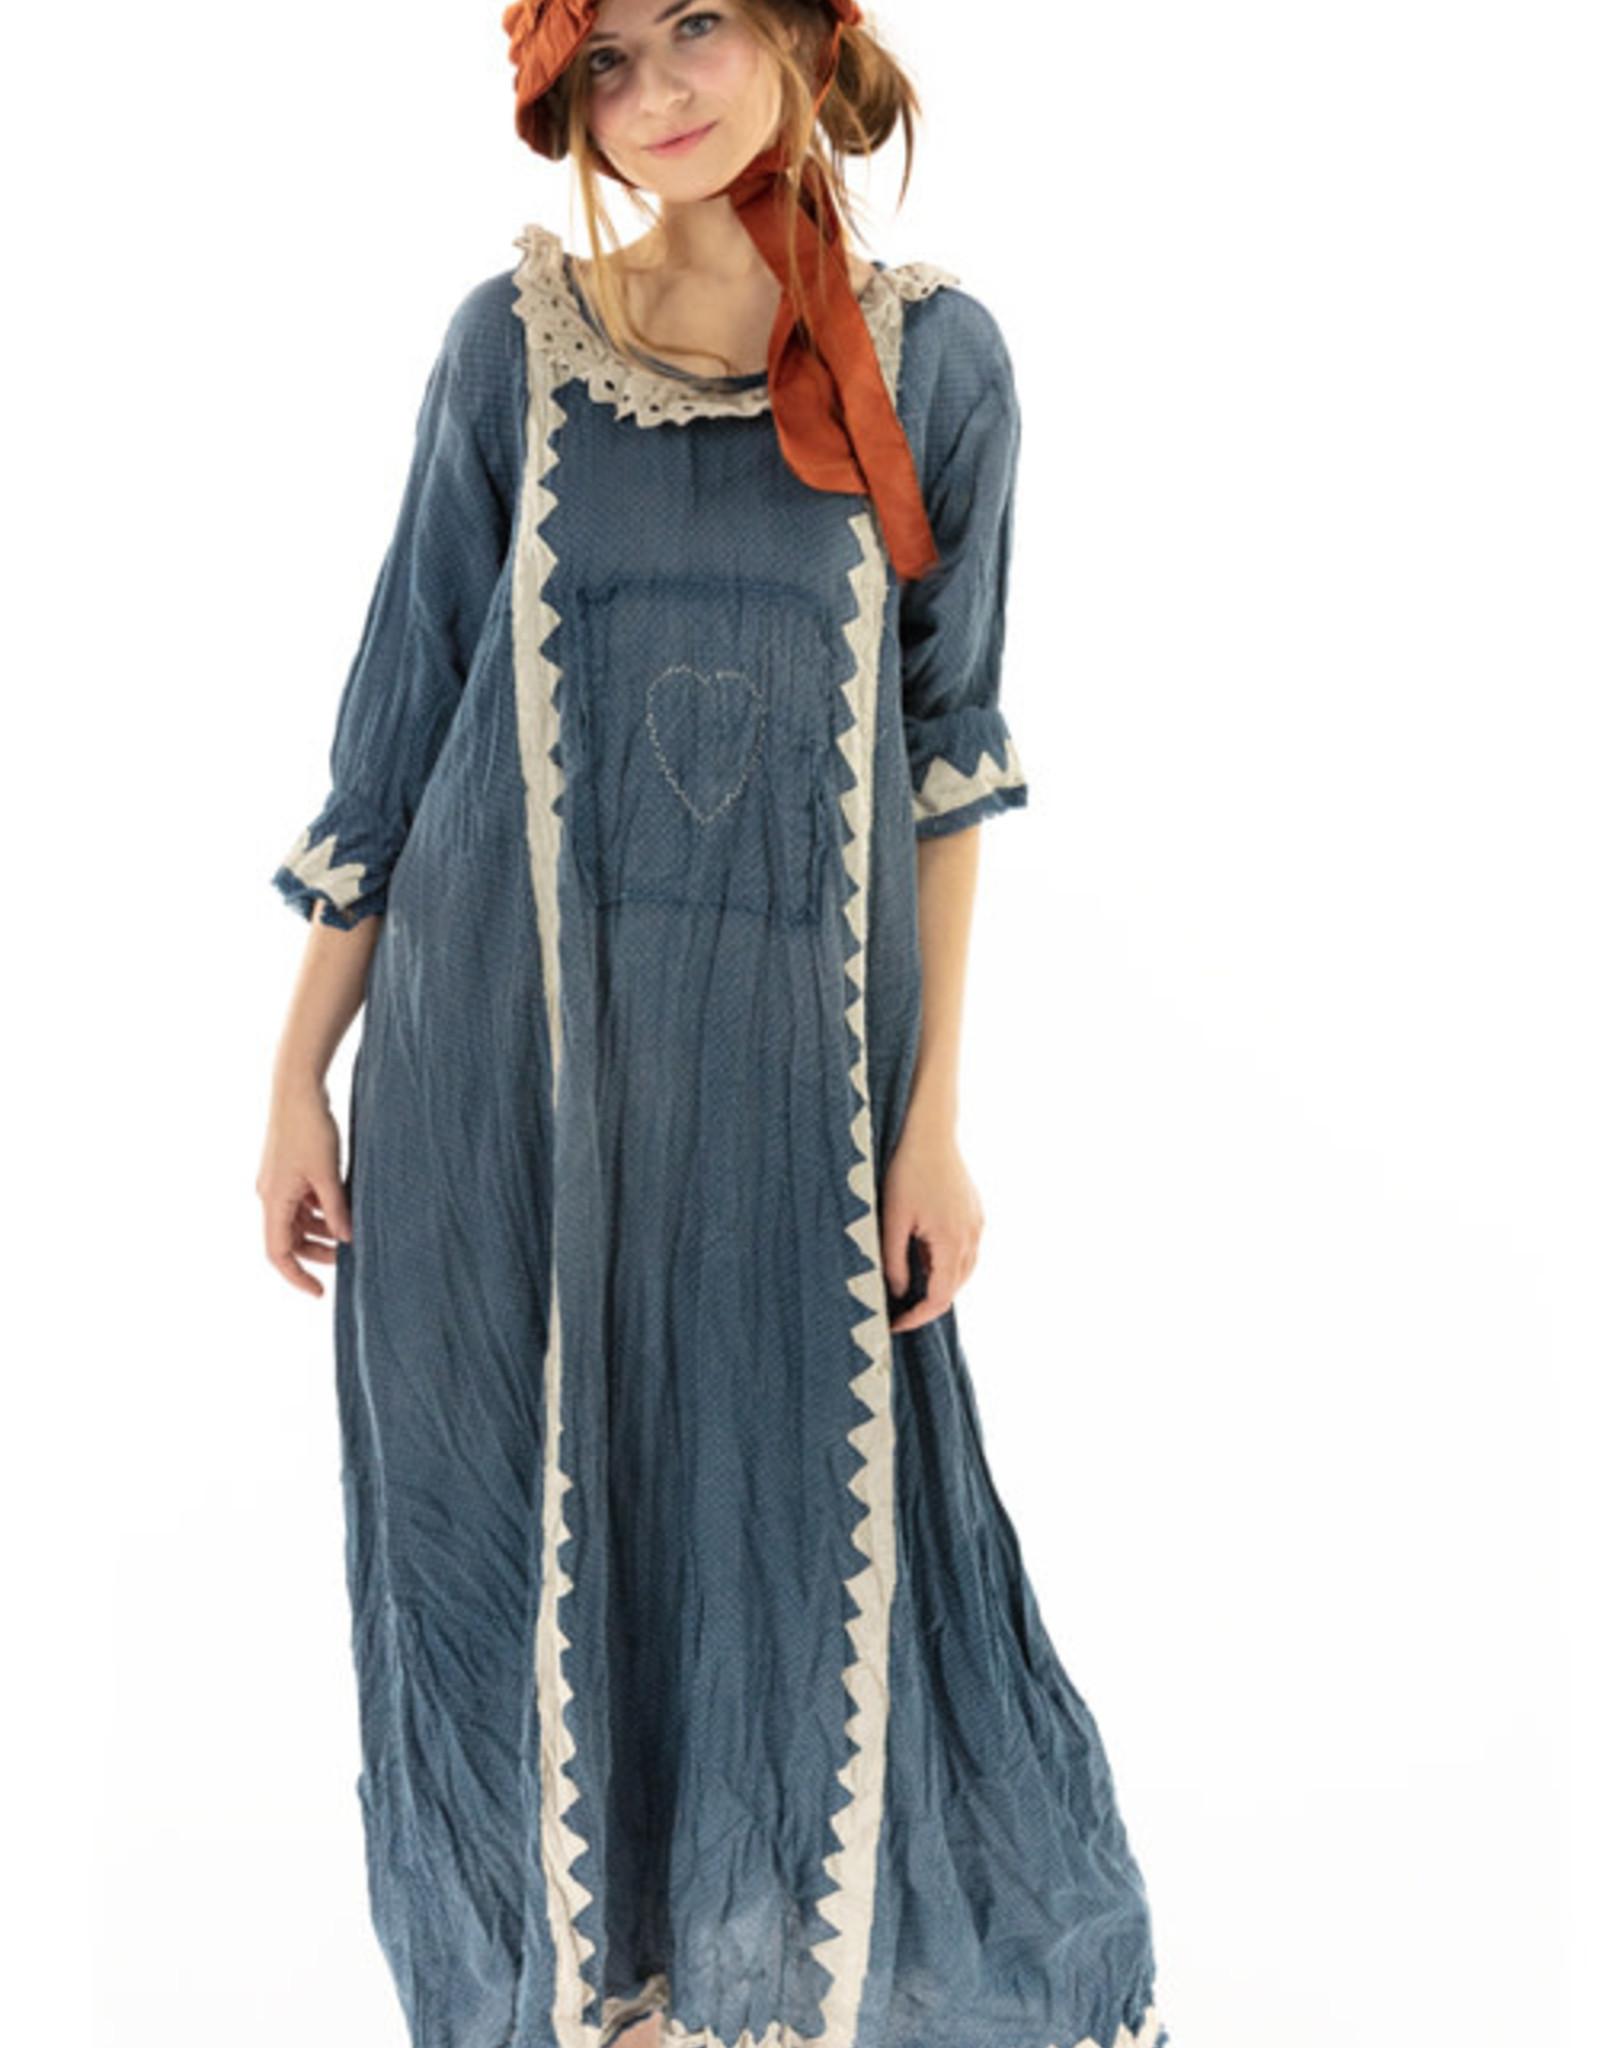 MAGNOLIA PEARL Eudora Dress